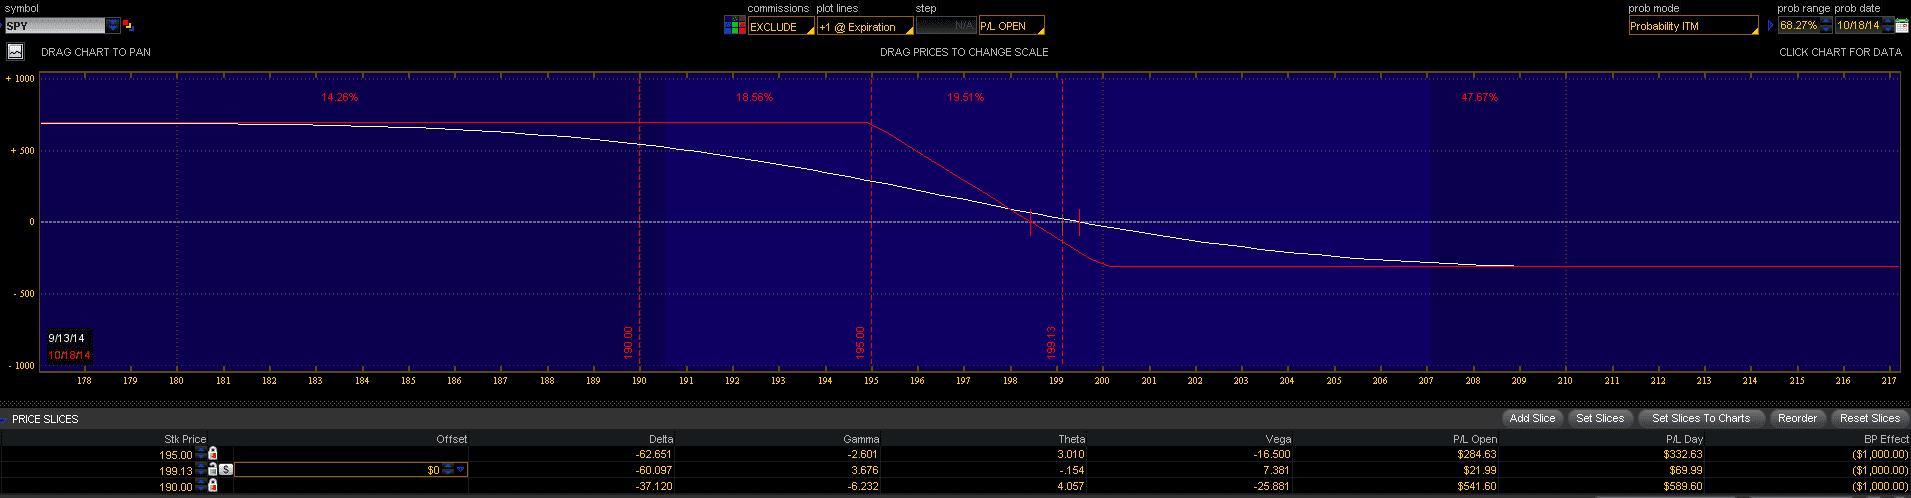 SPY Short Vertical Call Spread Risk Profile Sept 13-2014